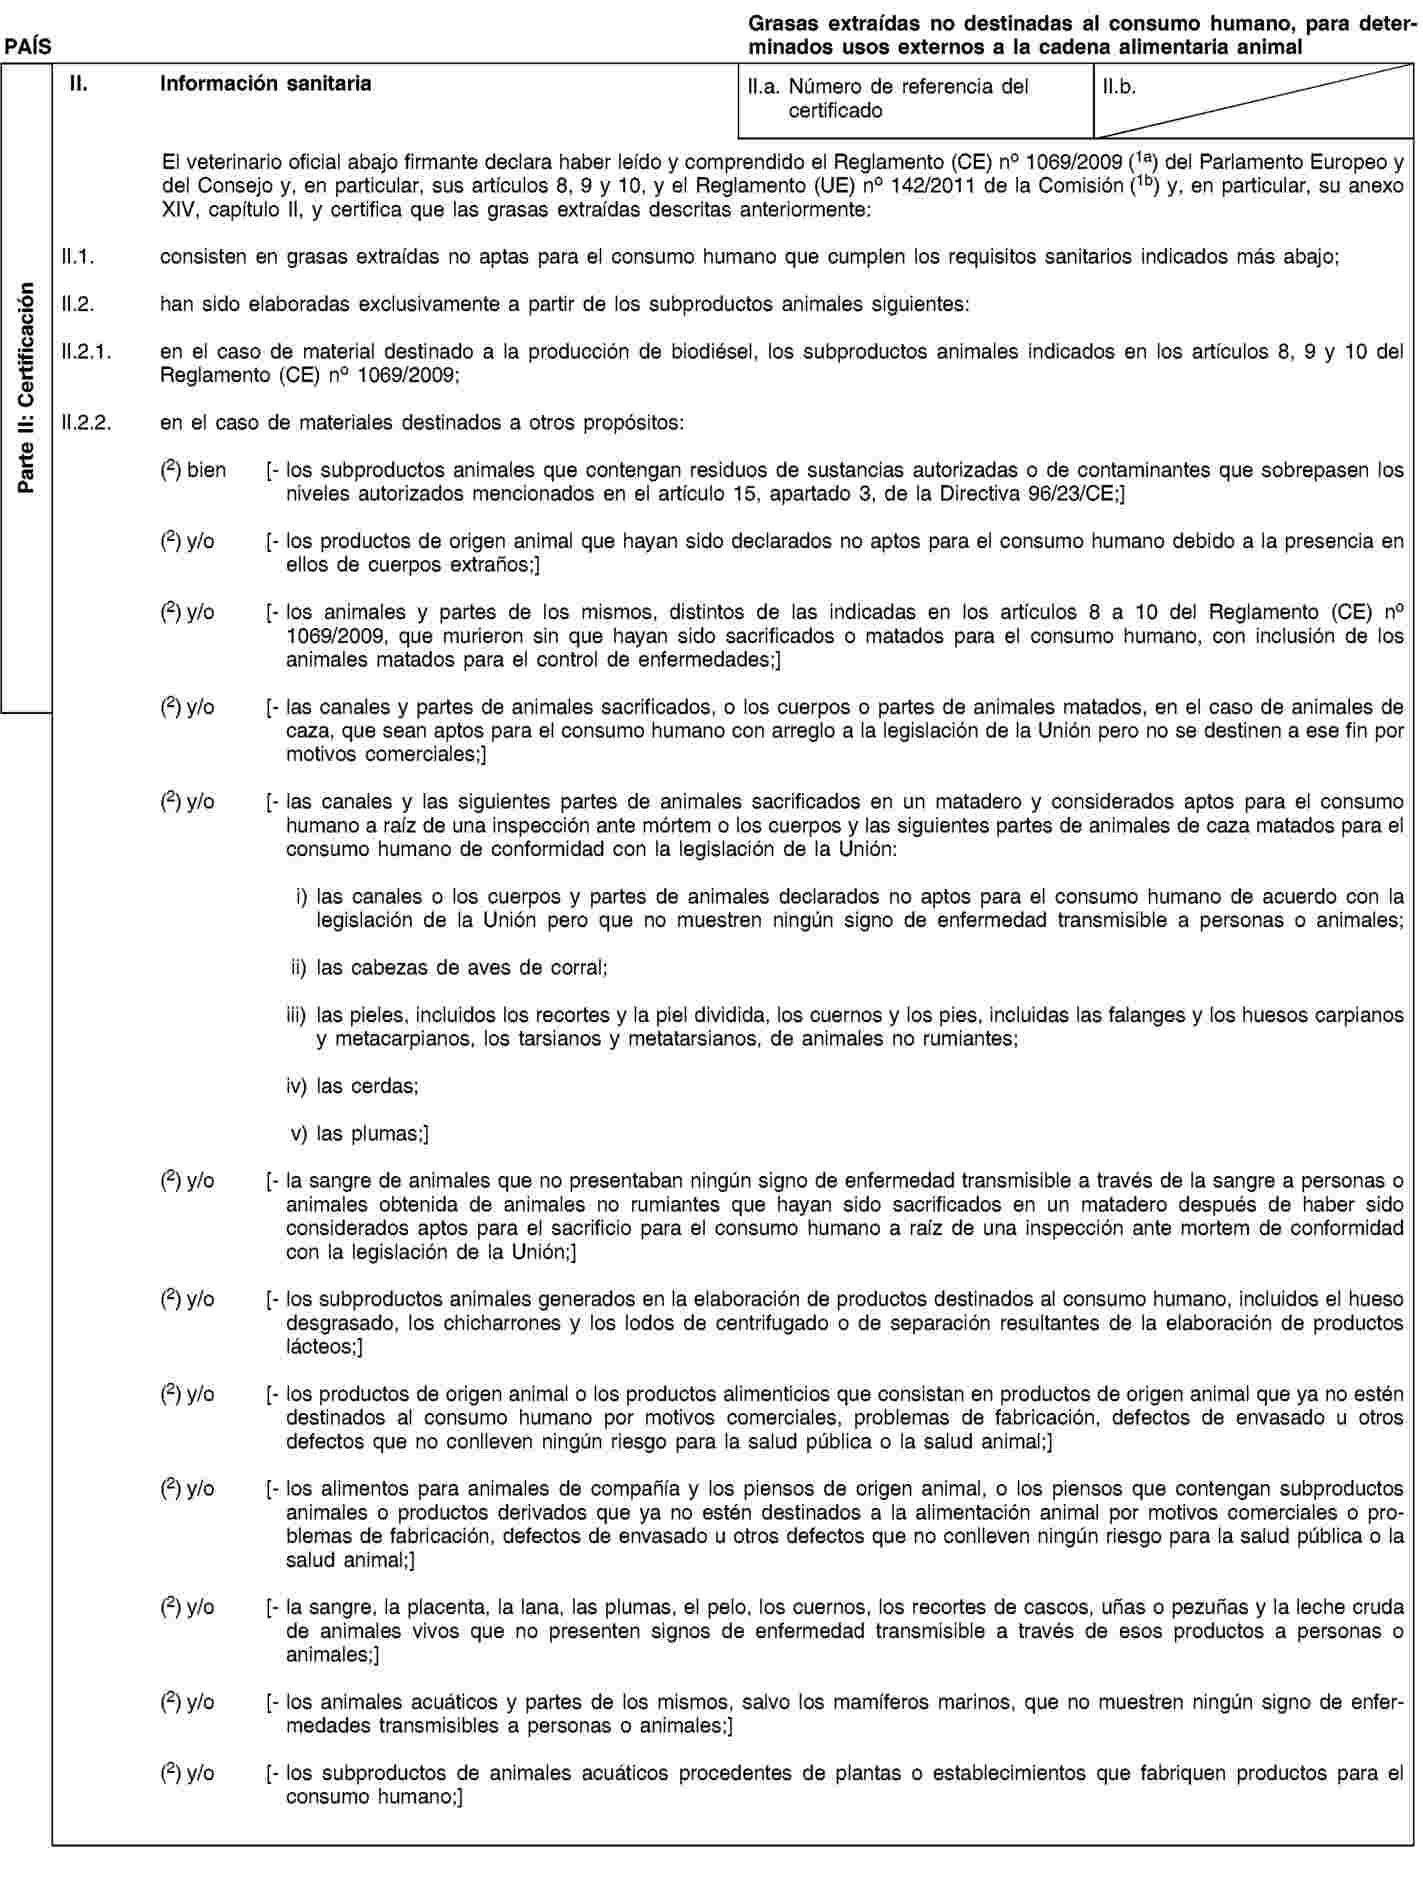 Imagen: https://eur-lex.europa.eu/resource.html?uri=uriserv:OJ.L_.2011.054.01.0001.01.SPA.xhtml.L_2011054ES.01021101.tif.jpg